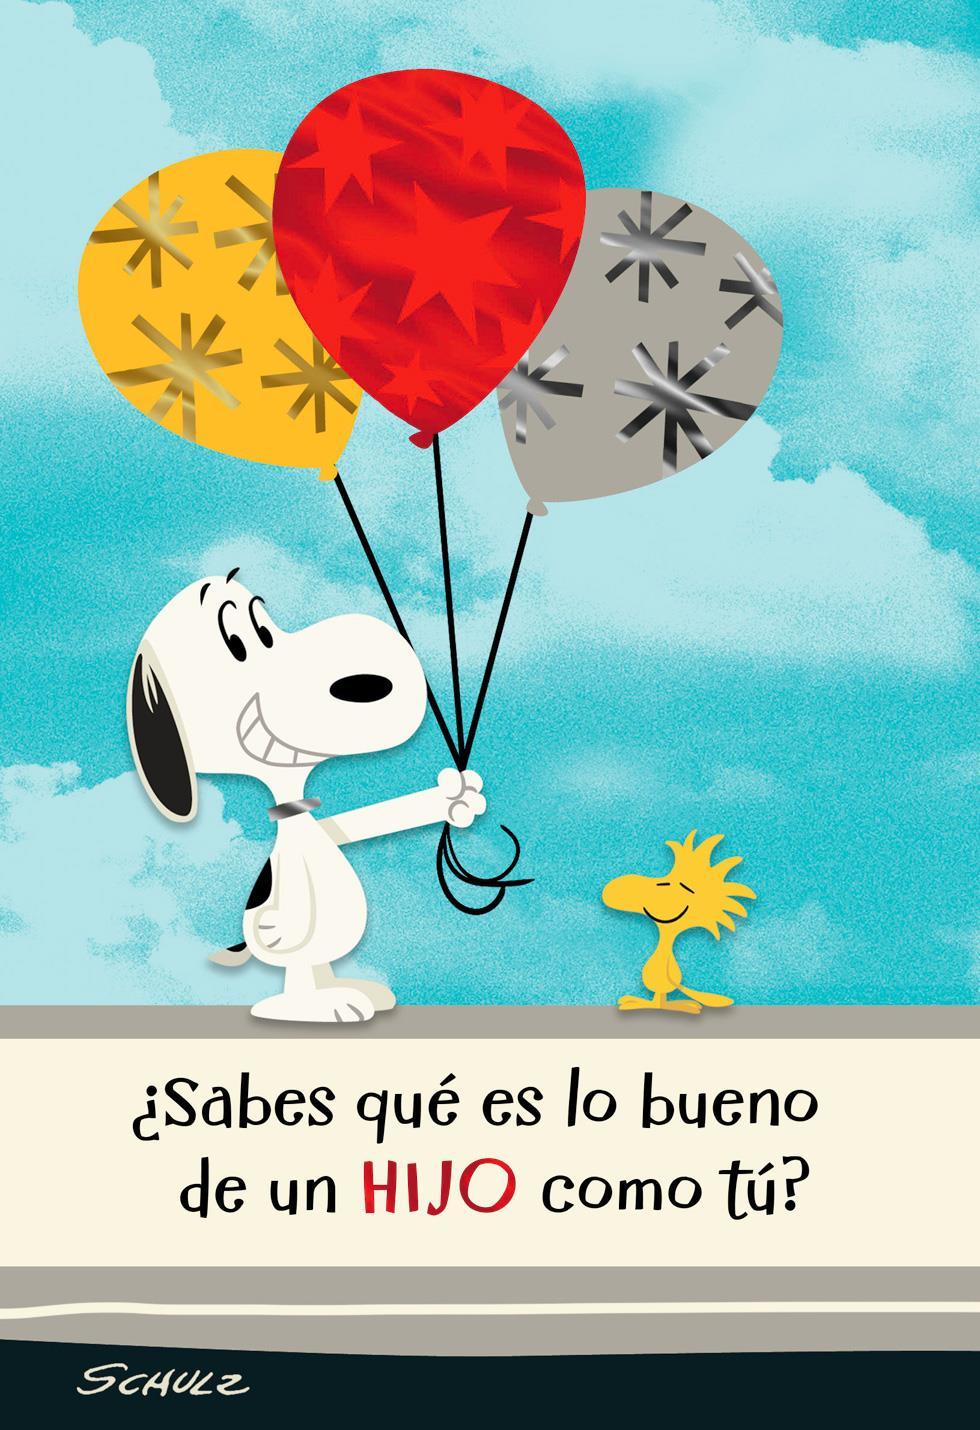 Peanuts Snoopy And Woodstock Spanish Language Birthday